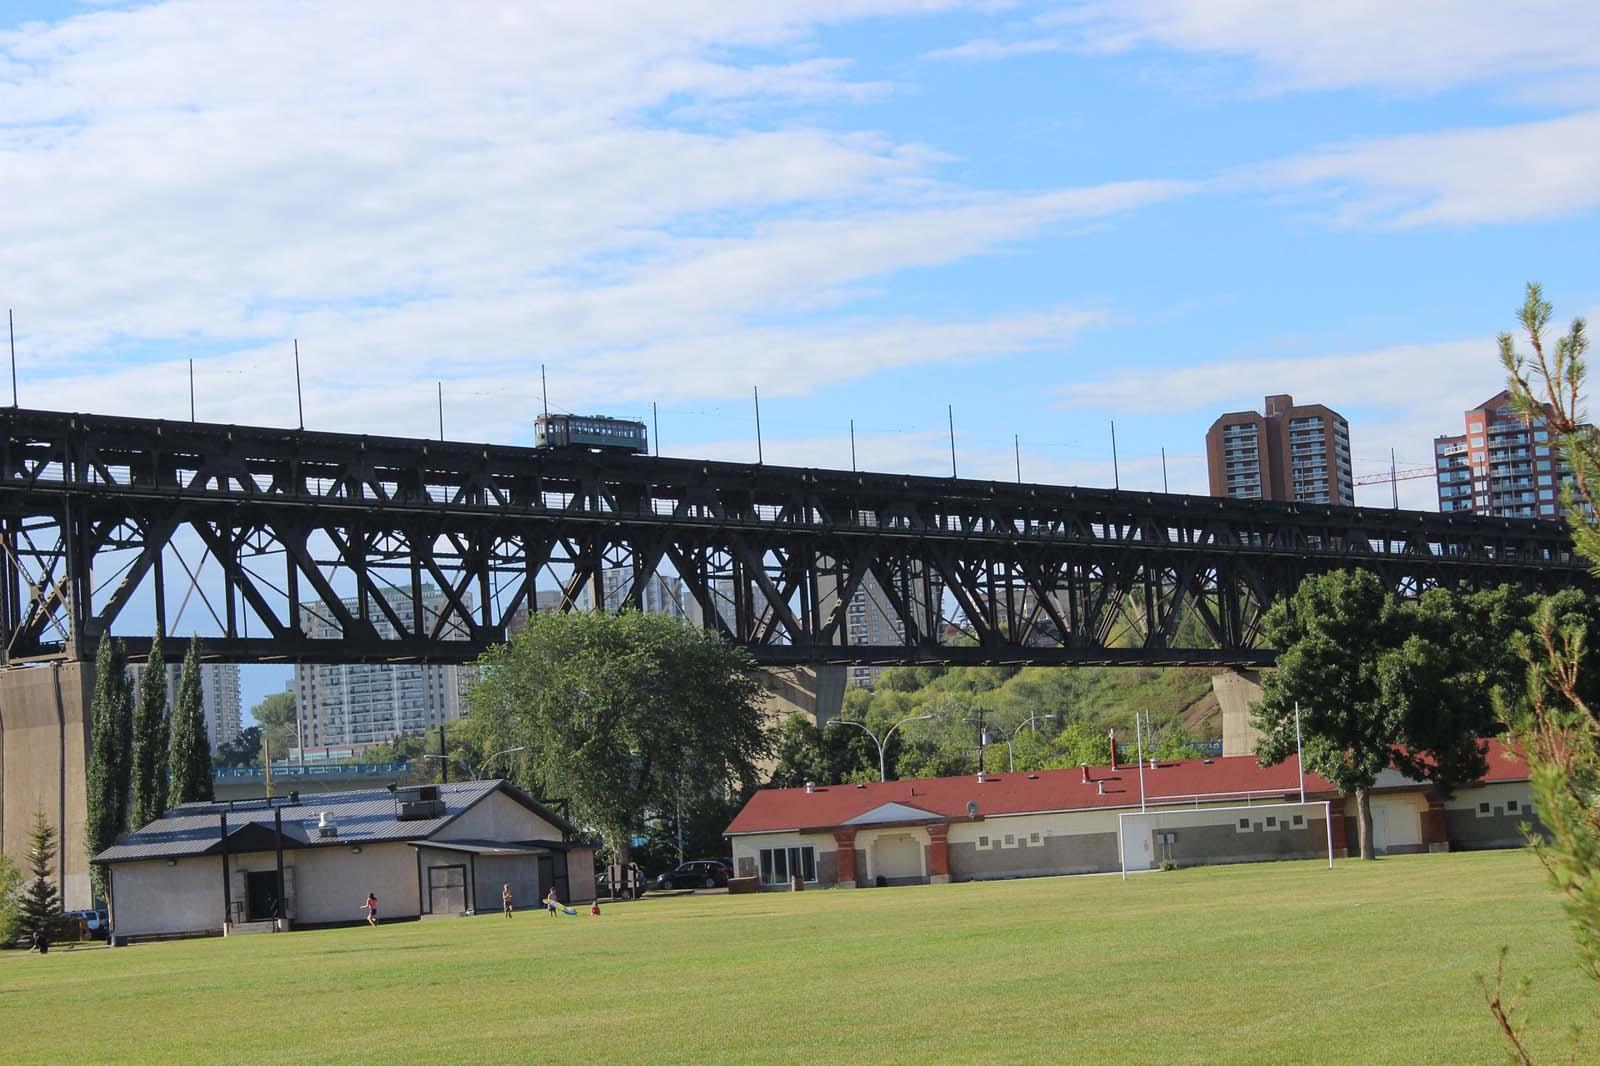 Edmonton things to do radial railway society